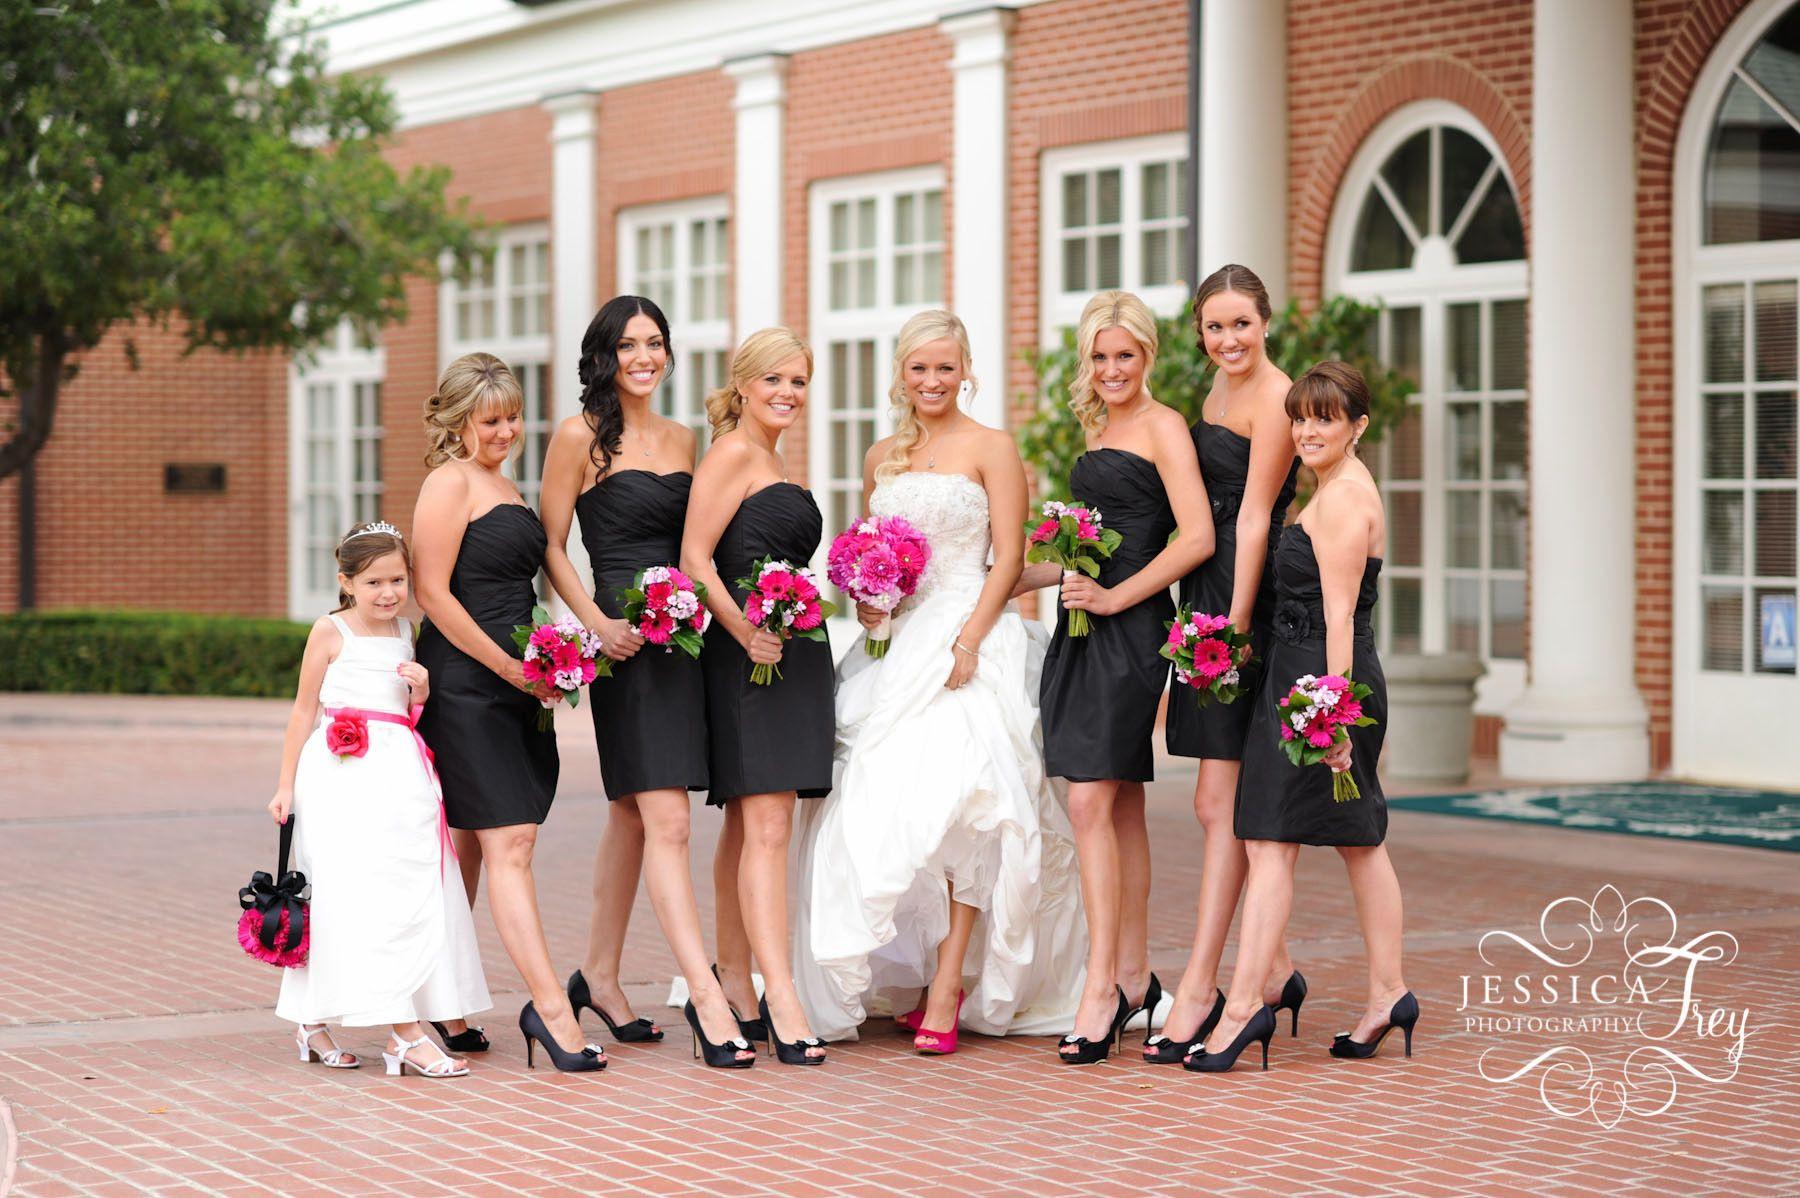 black wedding dresses Bridesmaid Love the black dresses